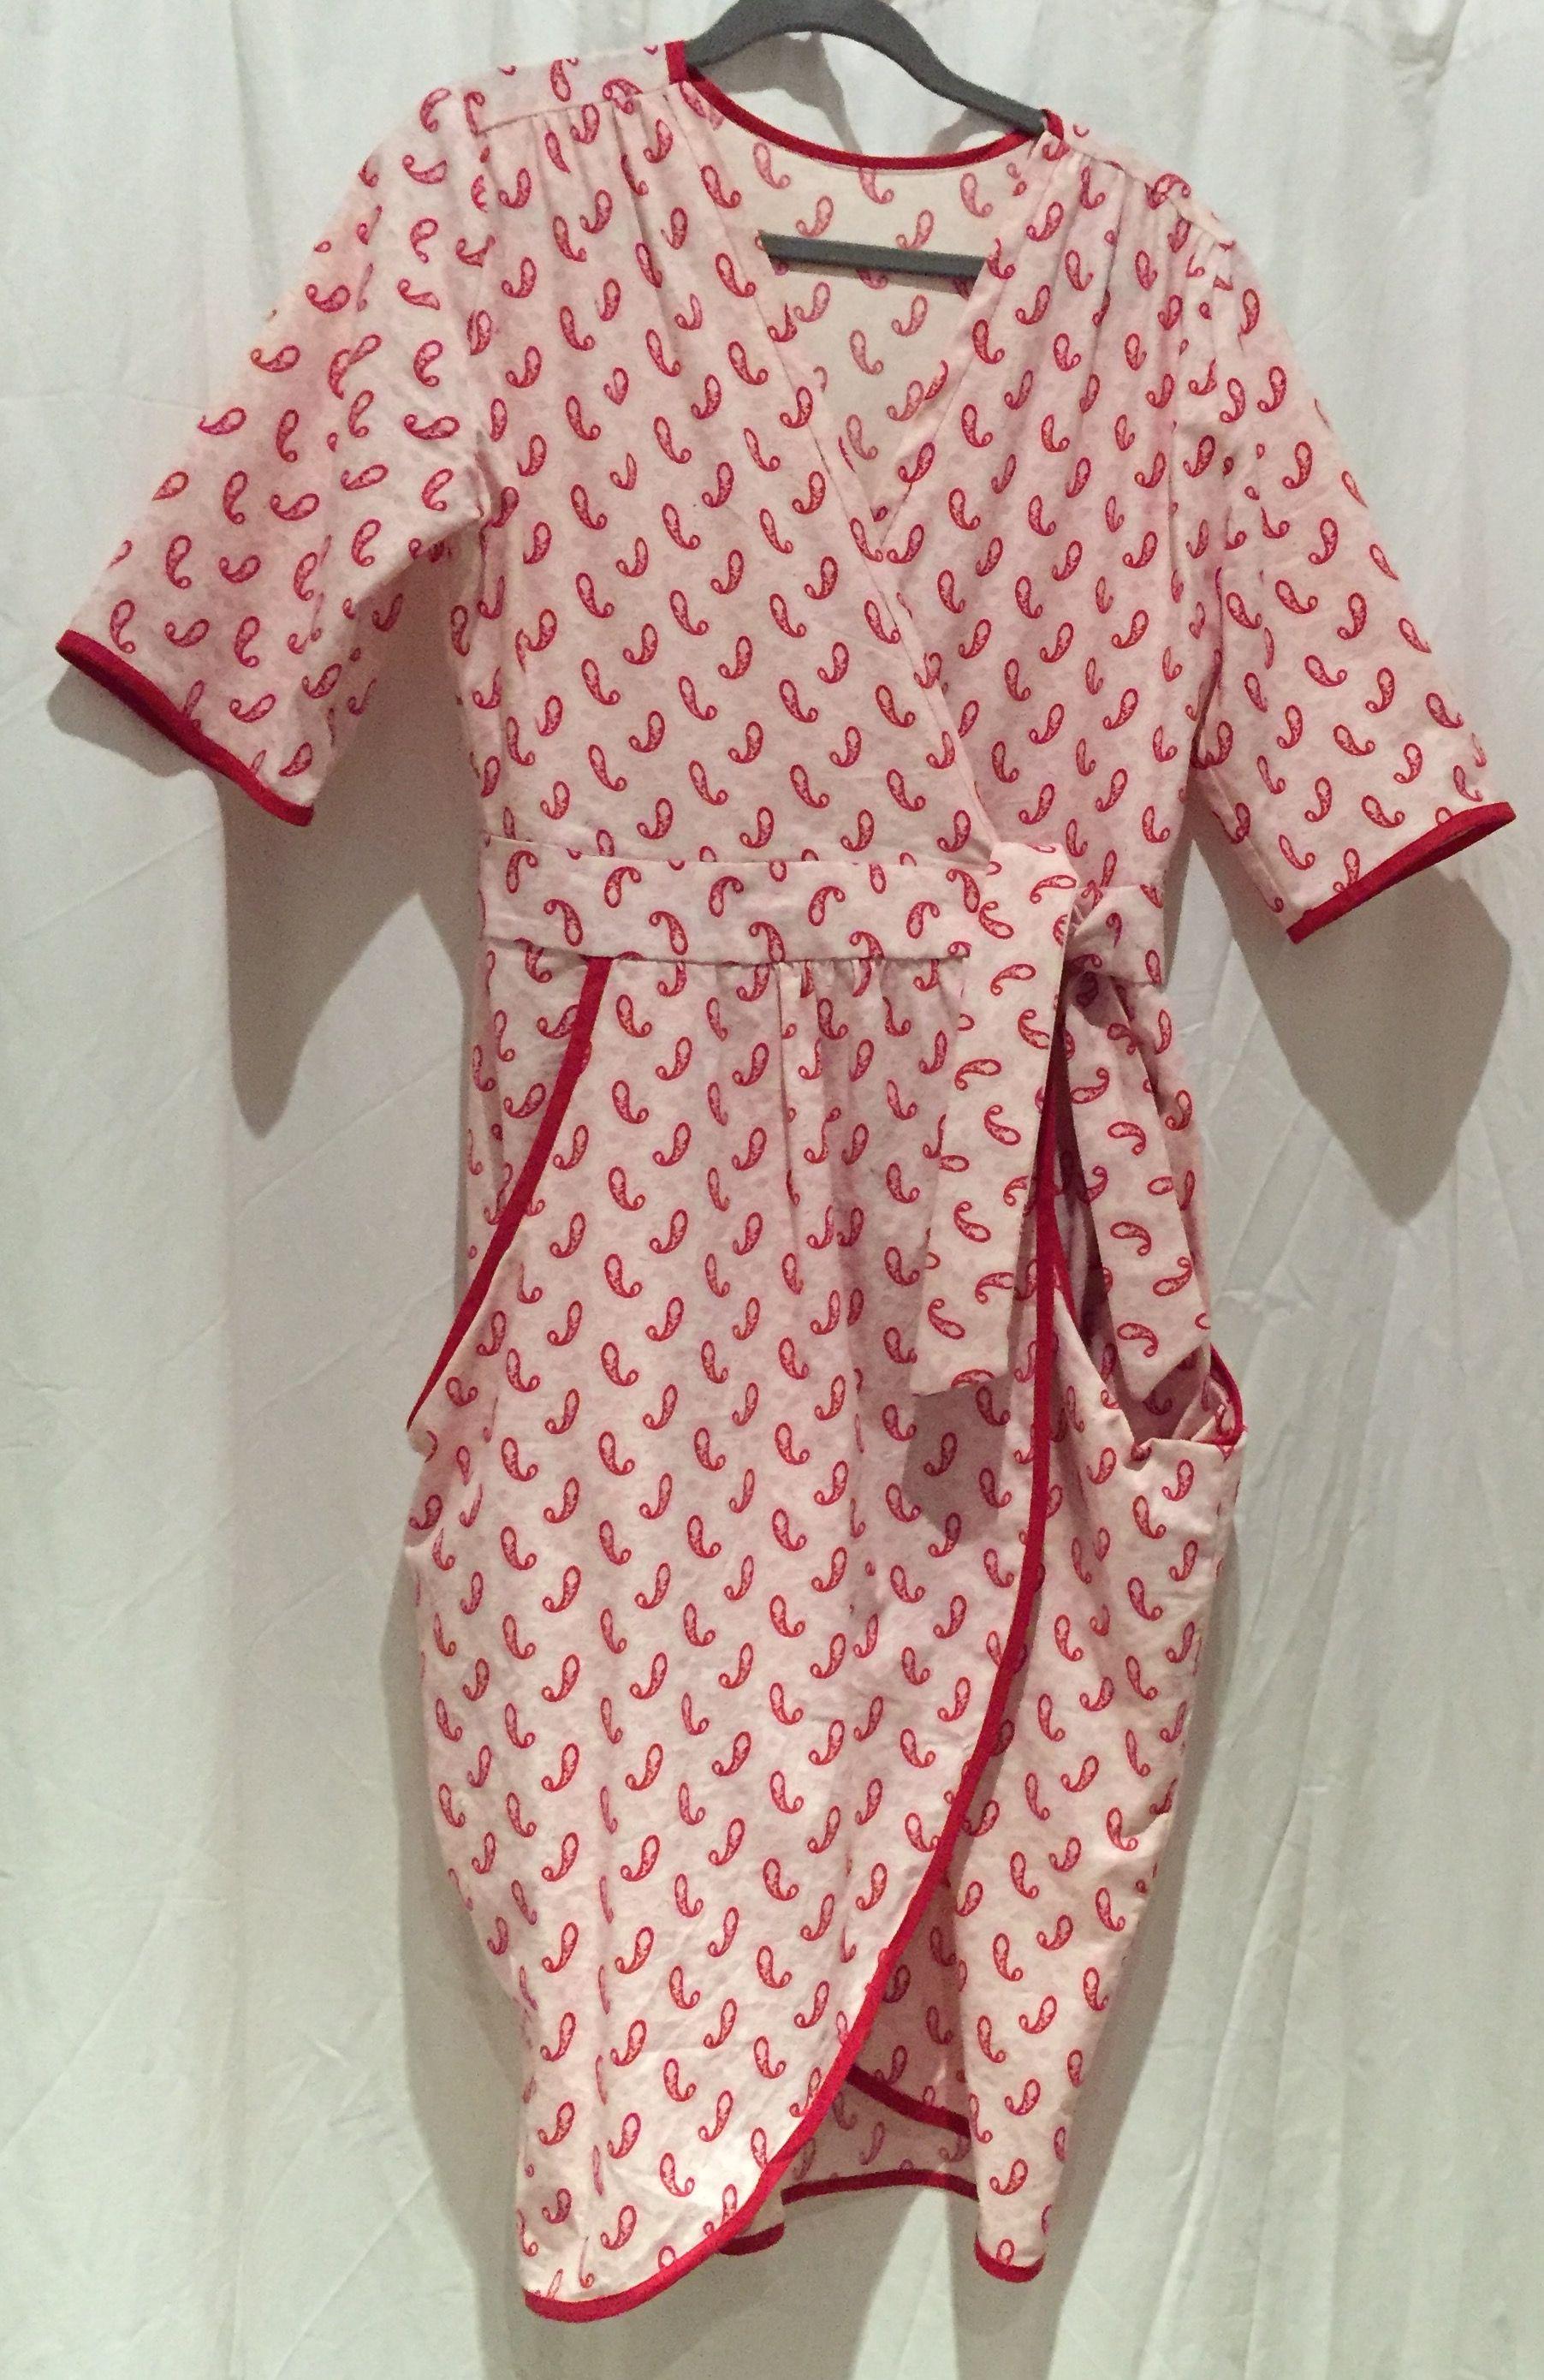 Schnittmuster Kleid Sally [Digital] | Pinterest